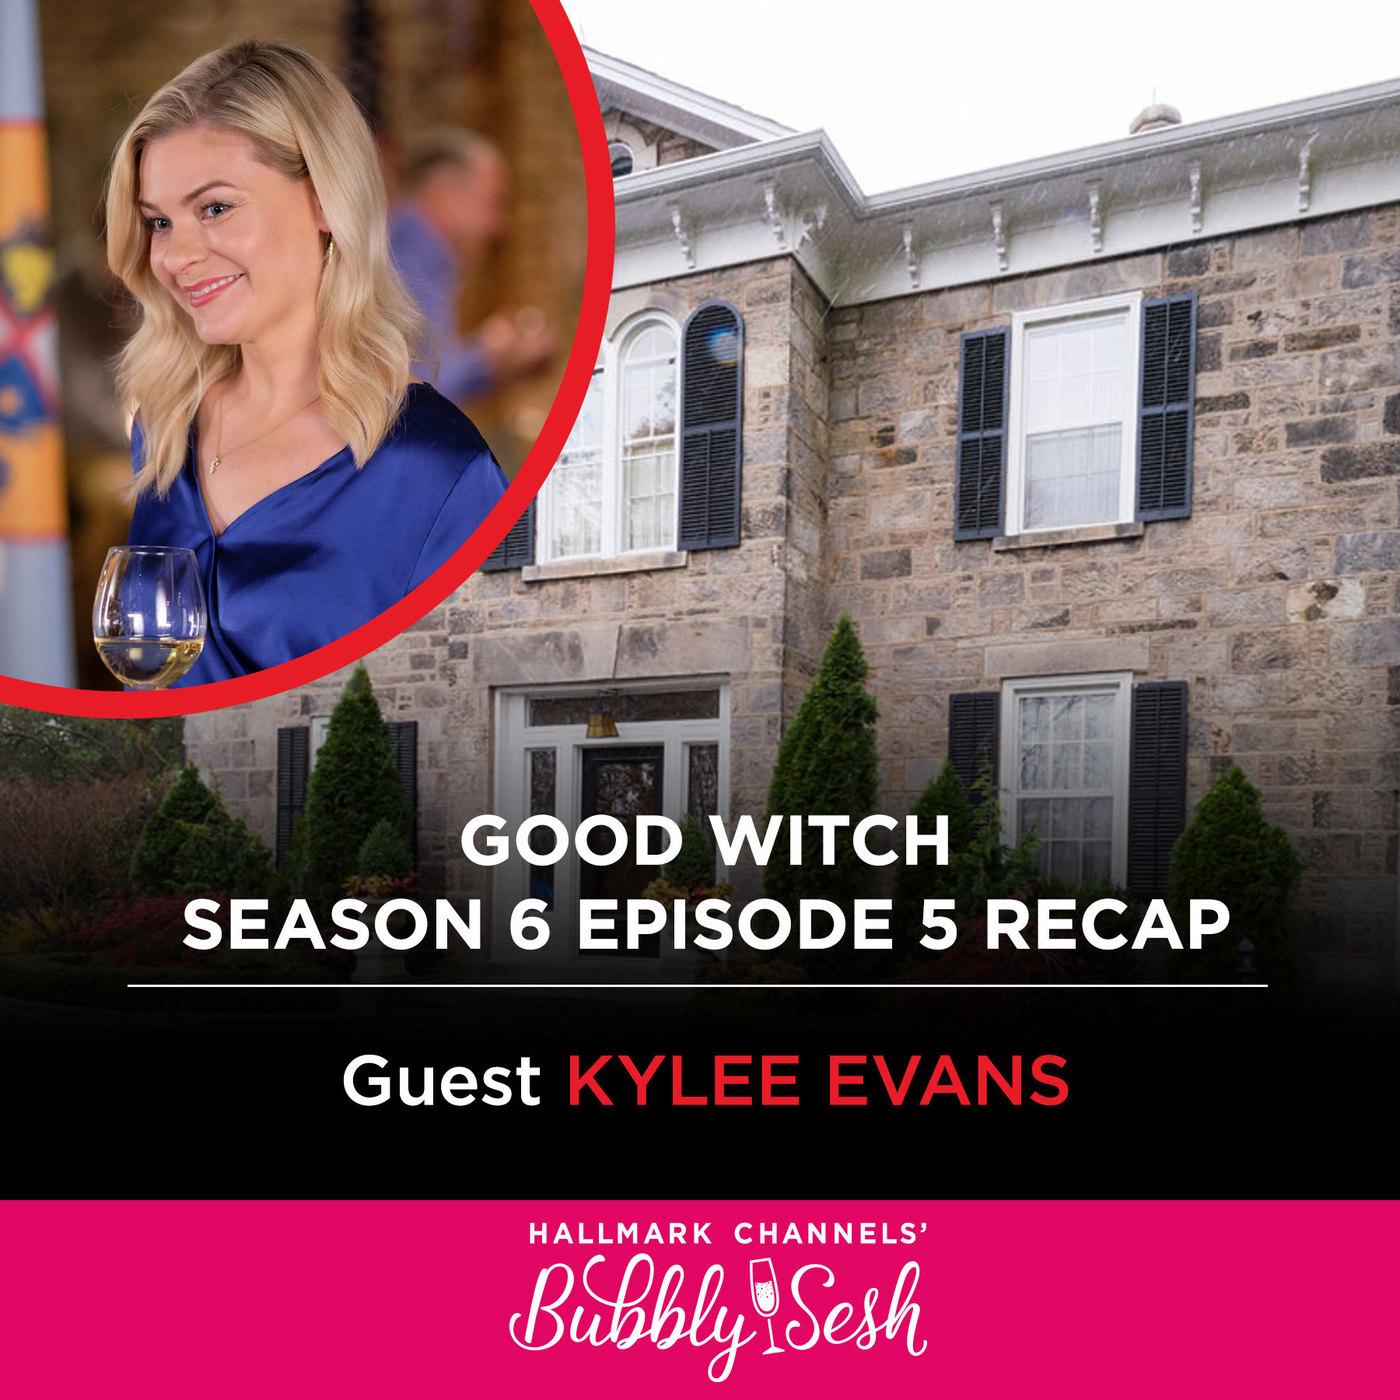 Good Witch Season 6 Episode 5 Recap with Guest Kylee Evans